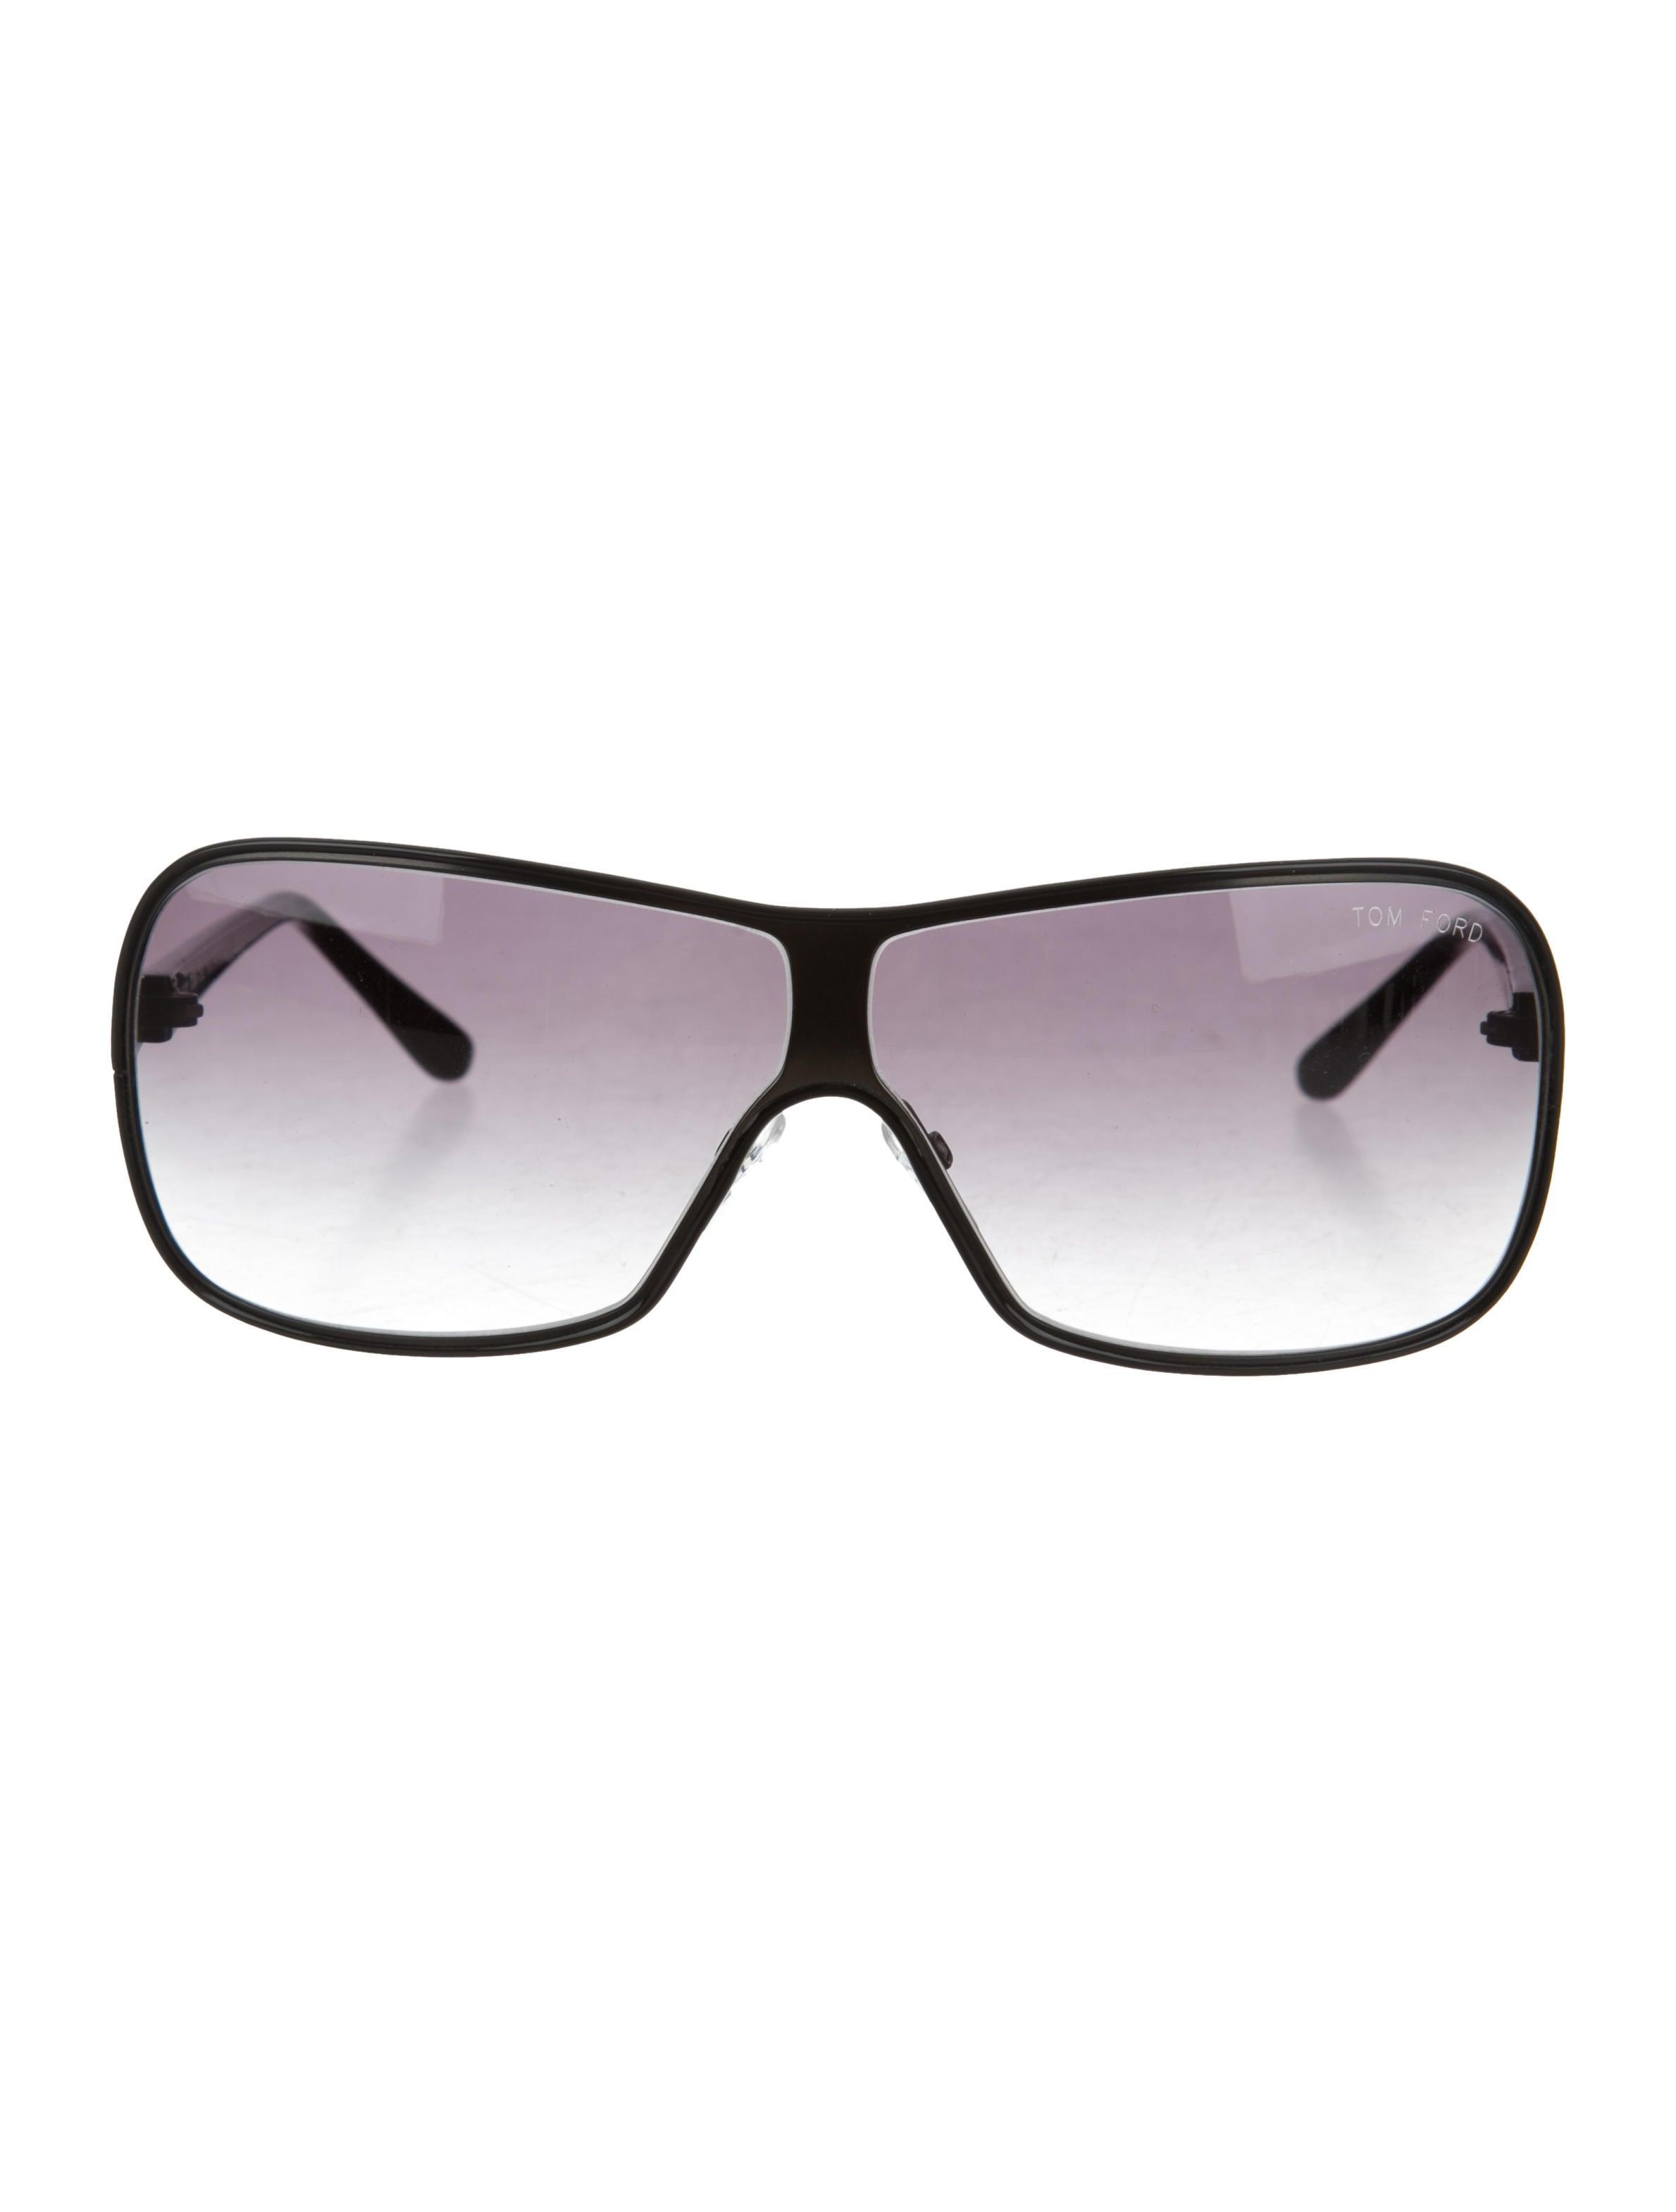 c62cfcb3eb Tom Ford Alexei Gradient Sunglasses - Accessories - TOM34800